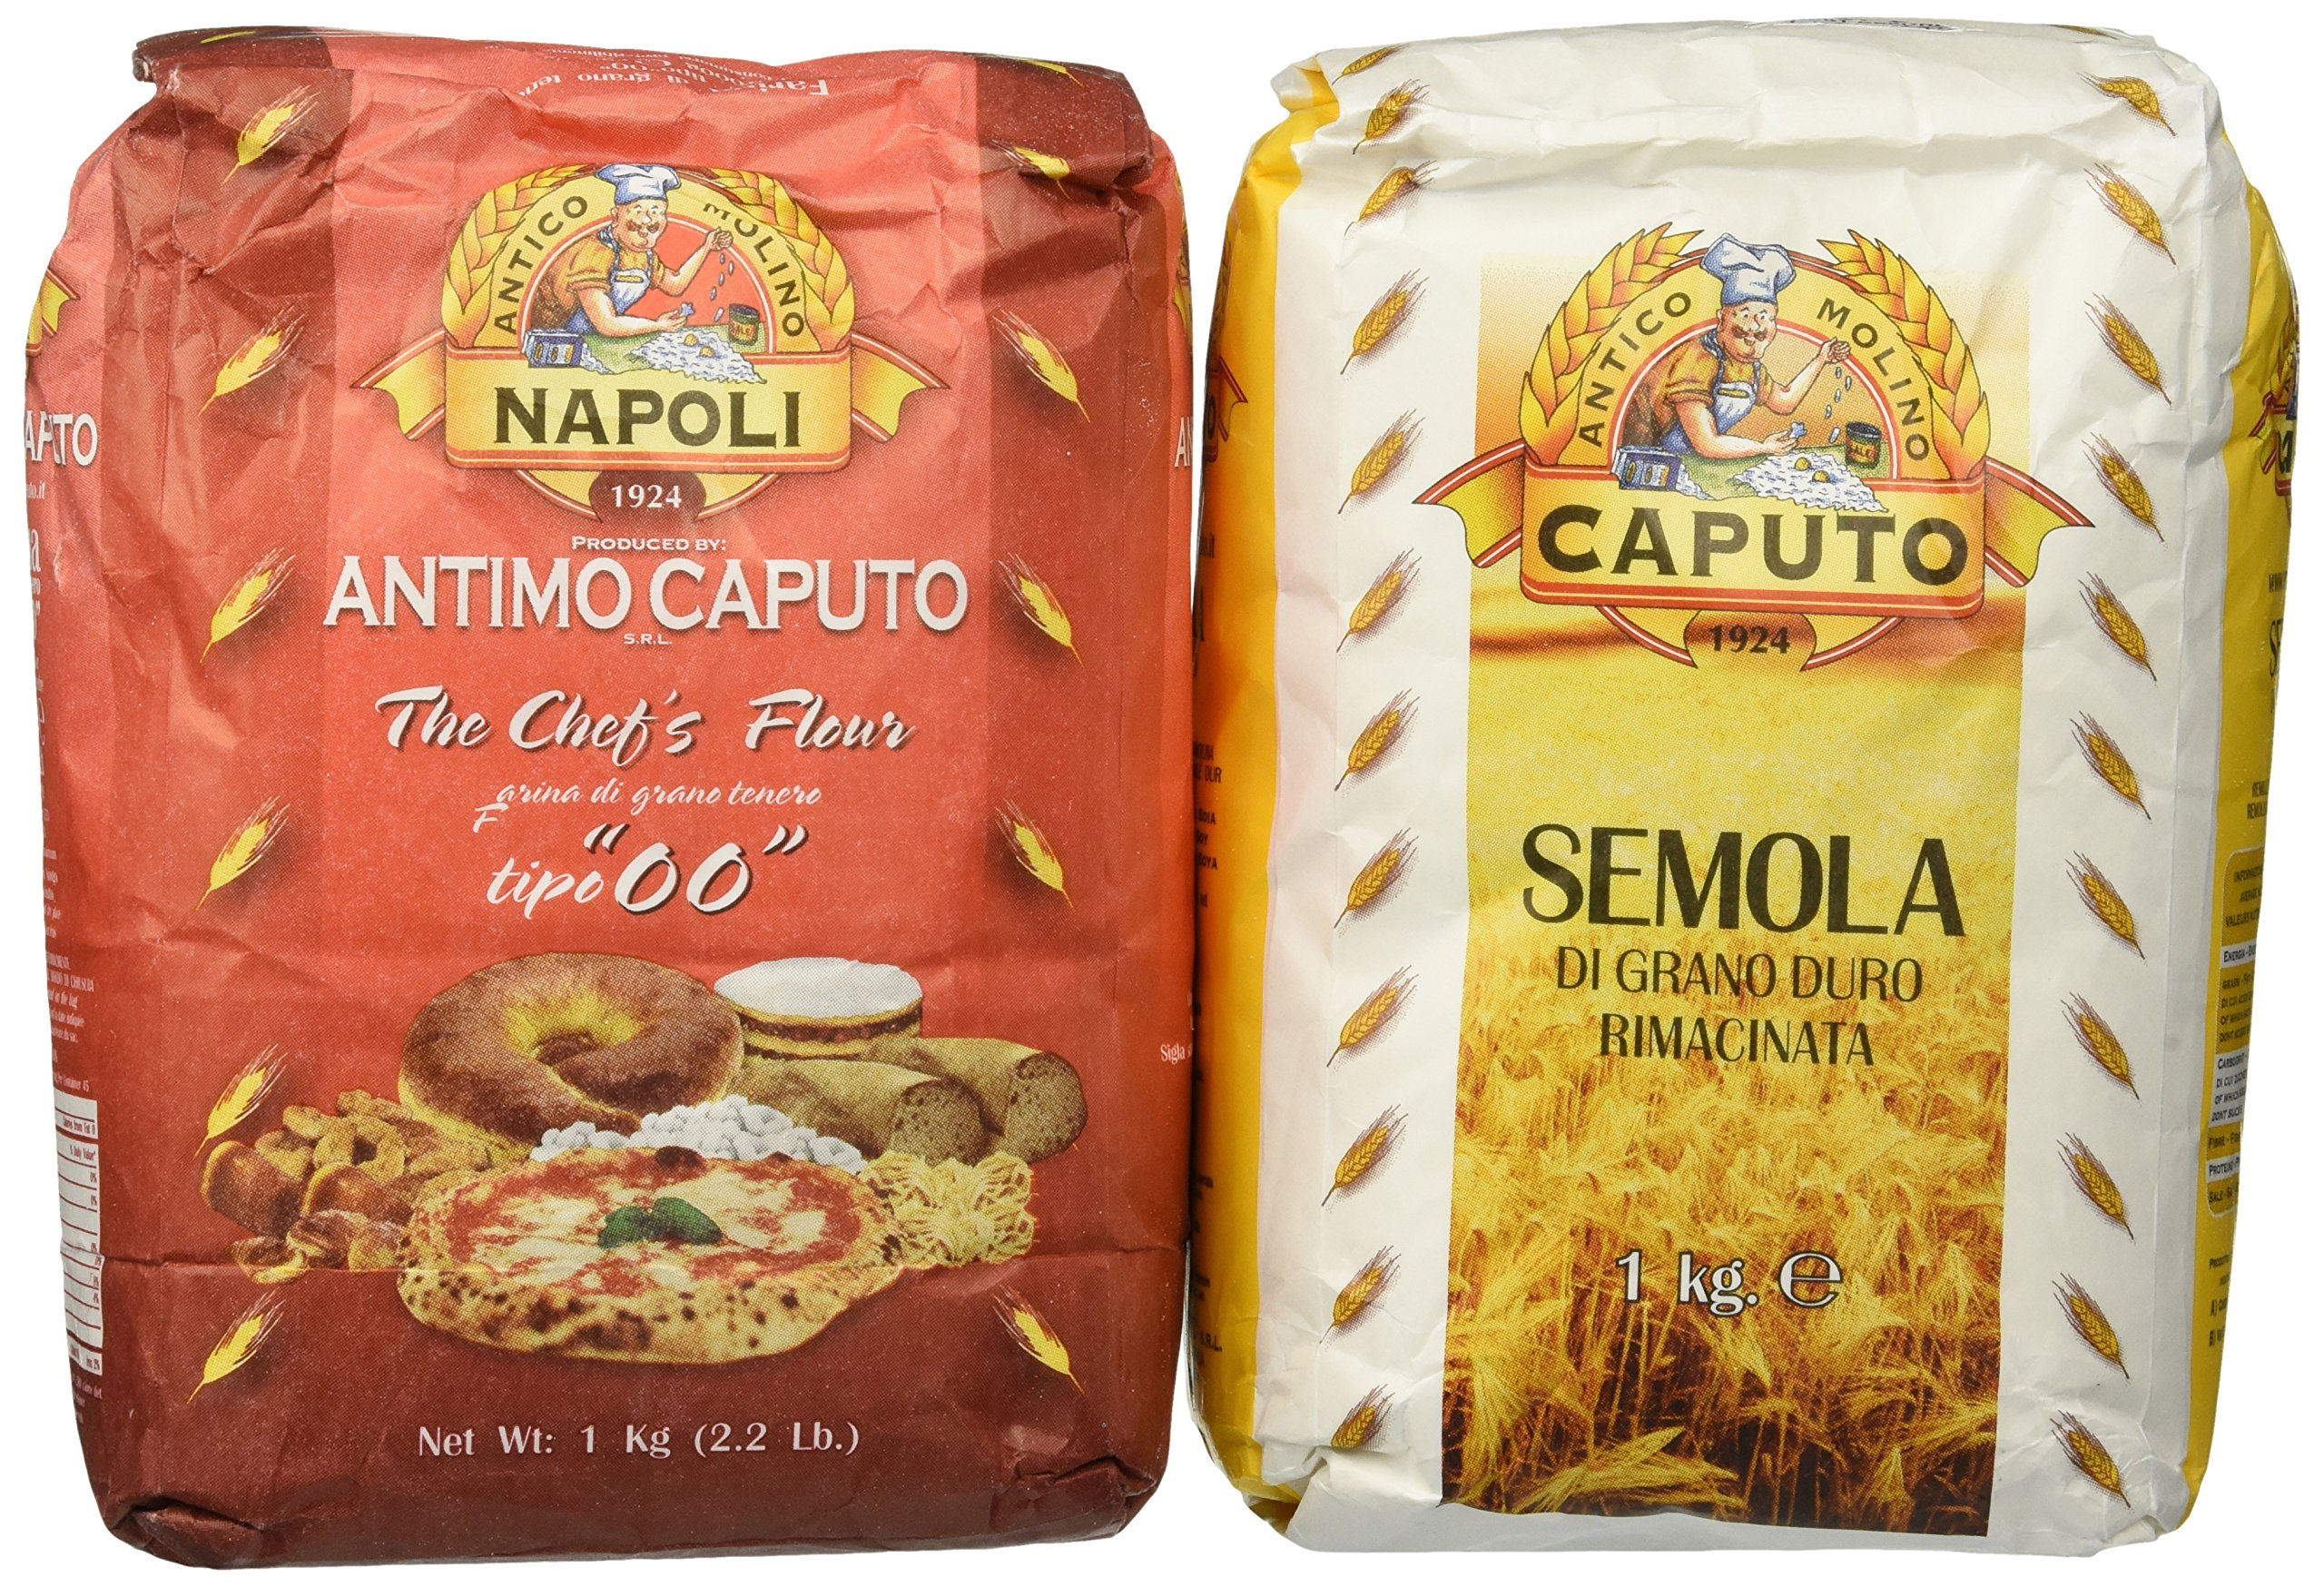 Molino Antimo Caputo '00' Flour + Semola Flour (1+1 bags) by Molino Antimo Caputo Napoli